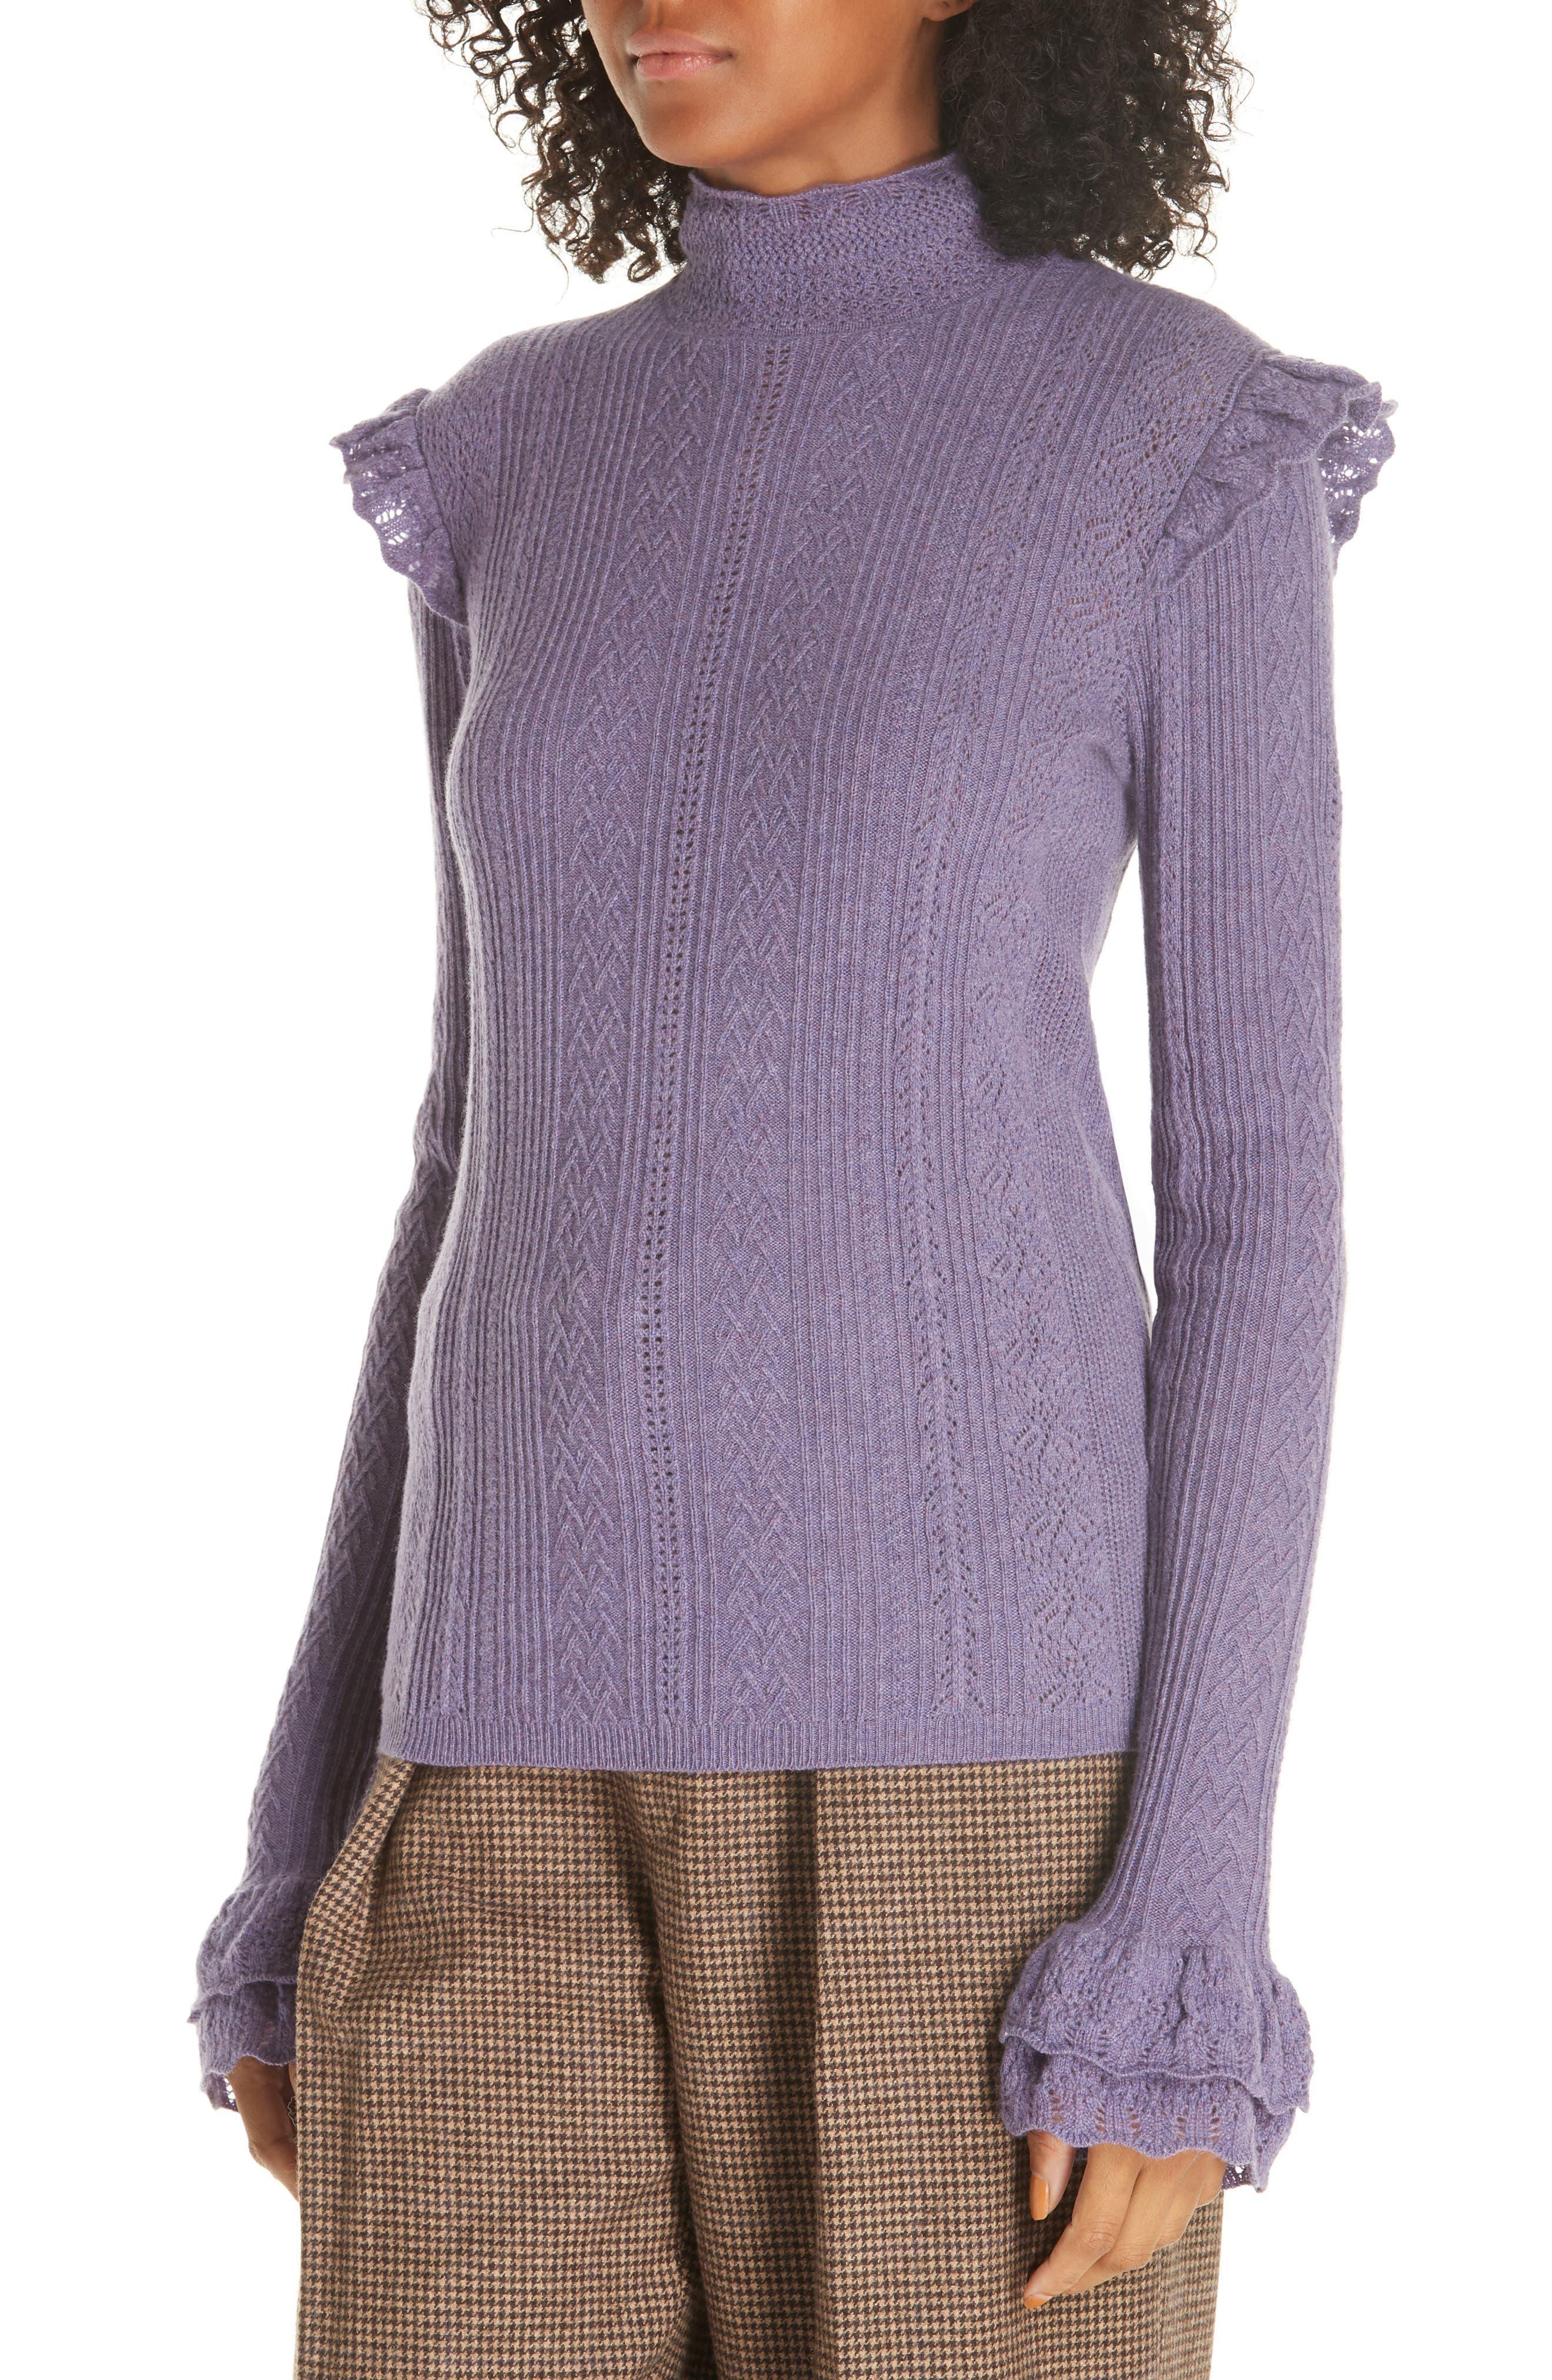 POLO RALPH LAUREN,                             Ruffle Detail Pointelle Sweater,                             Alternate thumbnail 4, color,                             500